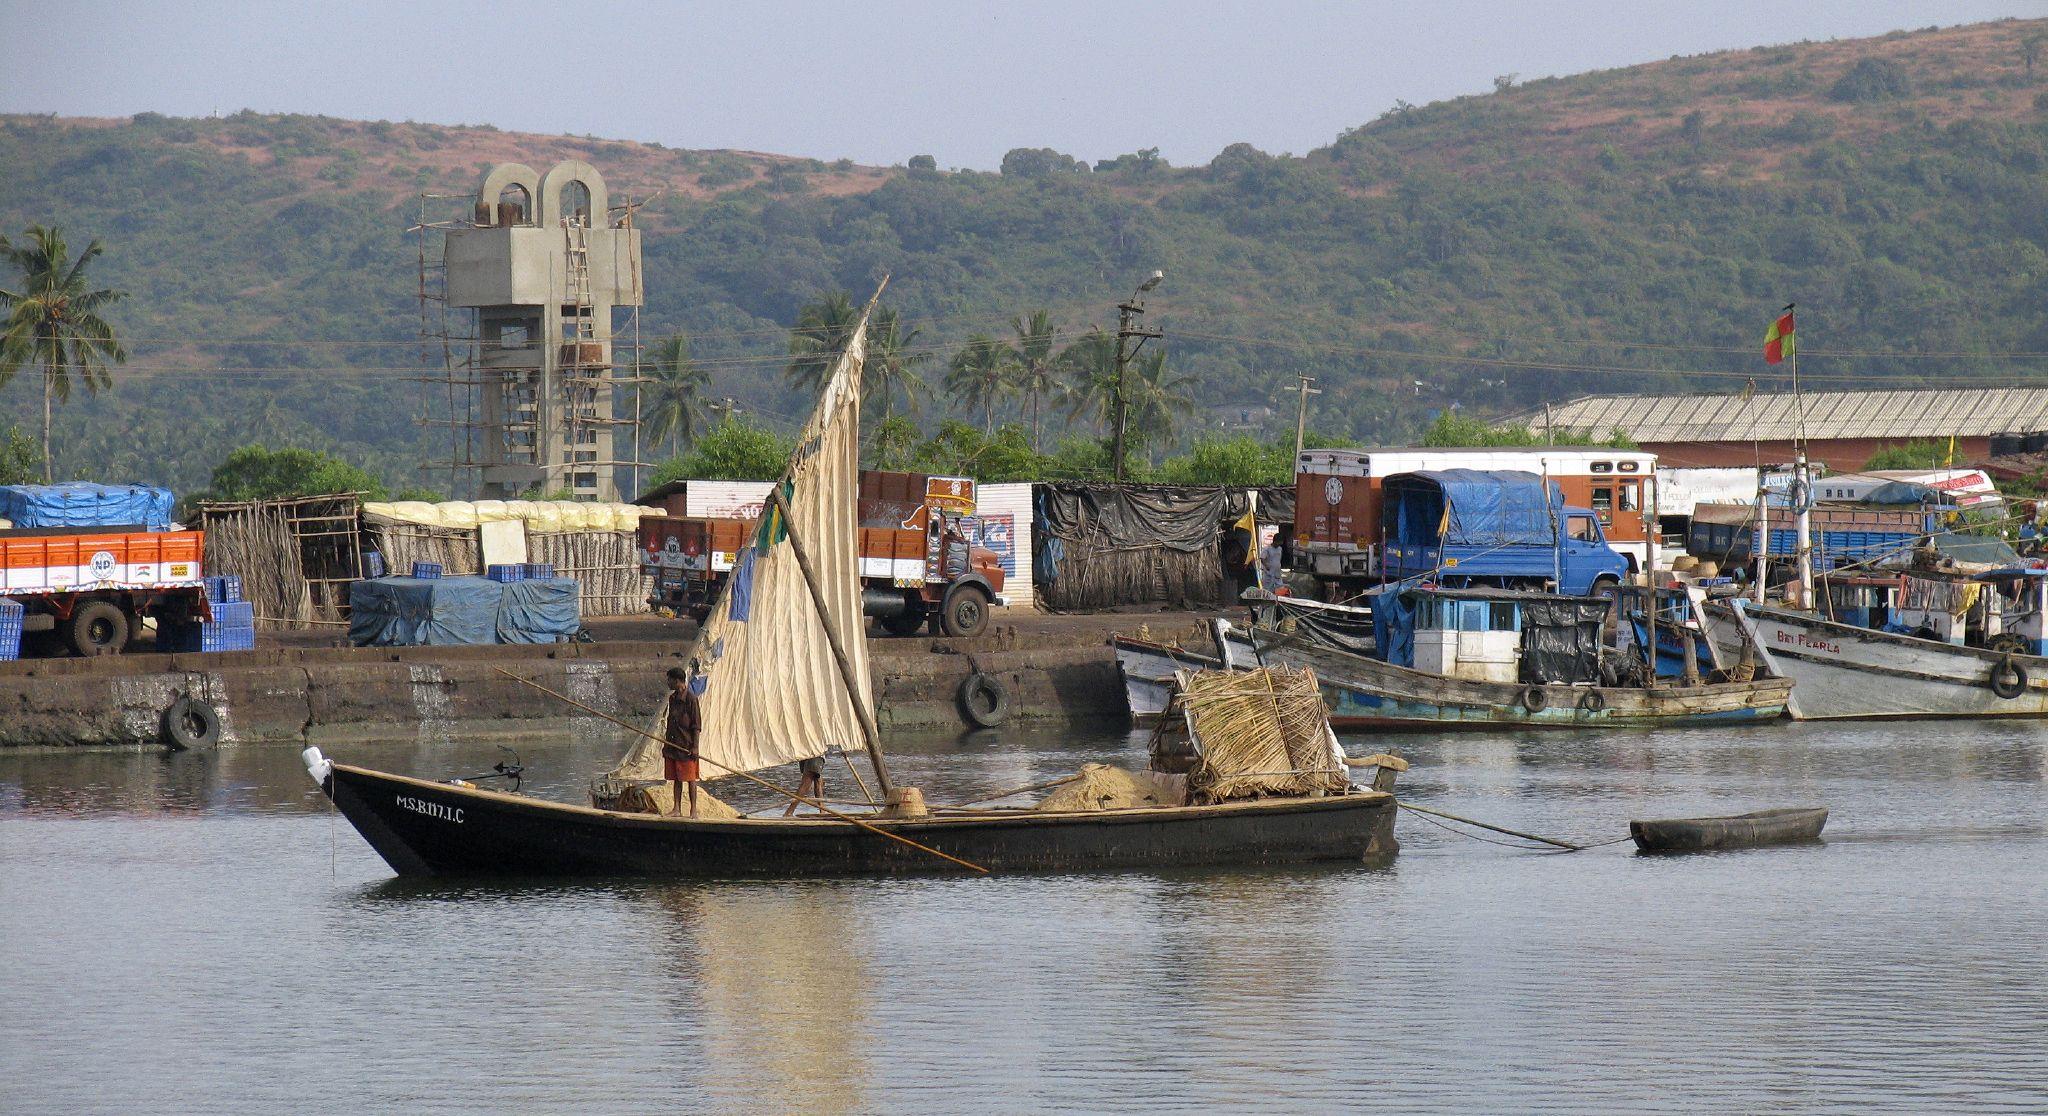 A boat on the Sal. By Steve Hancocks via Wikimedia Commons